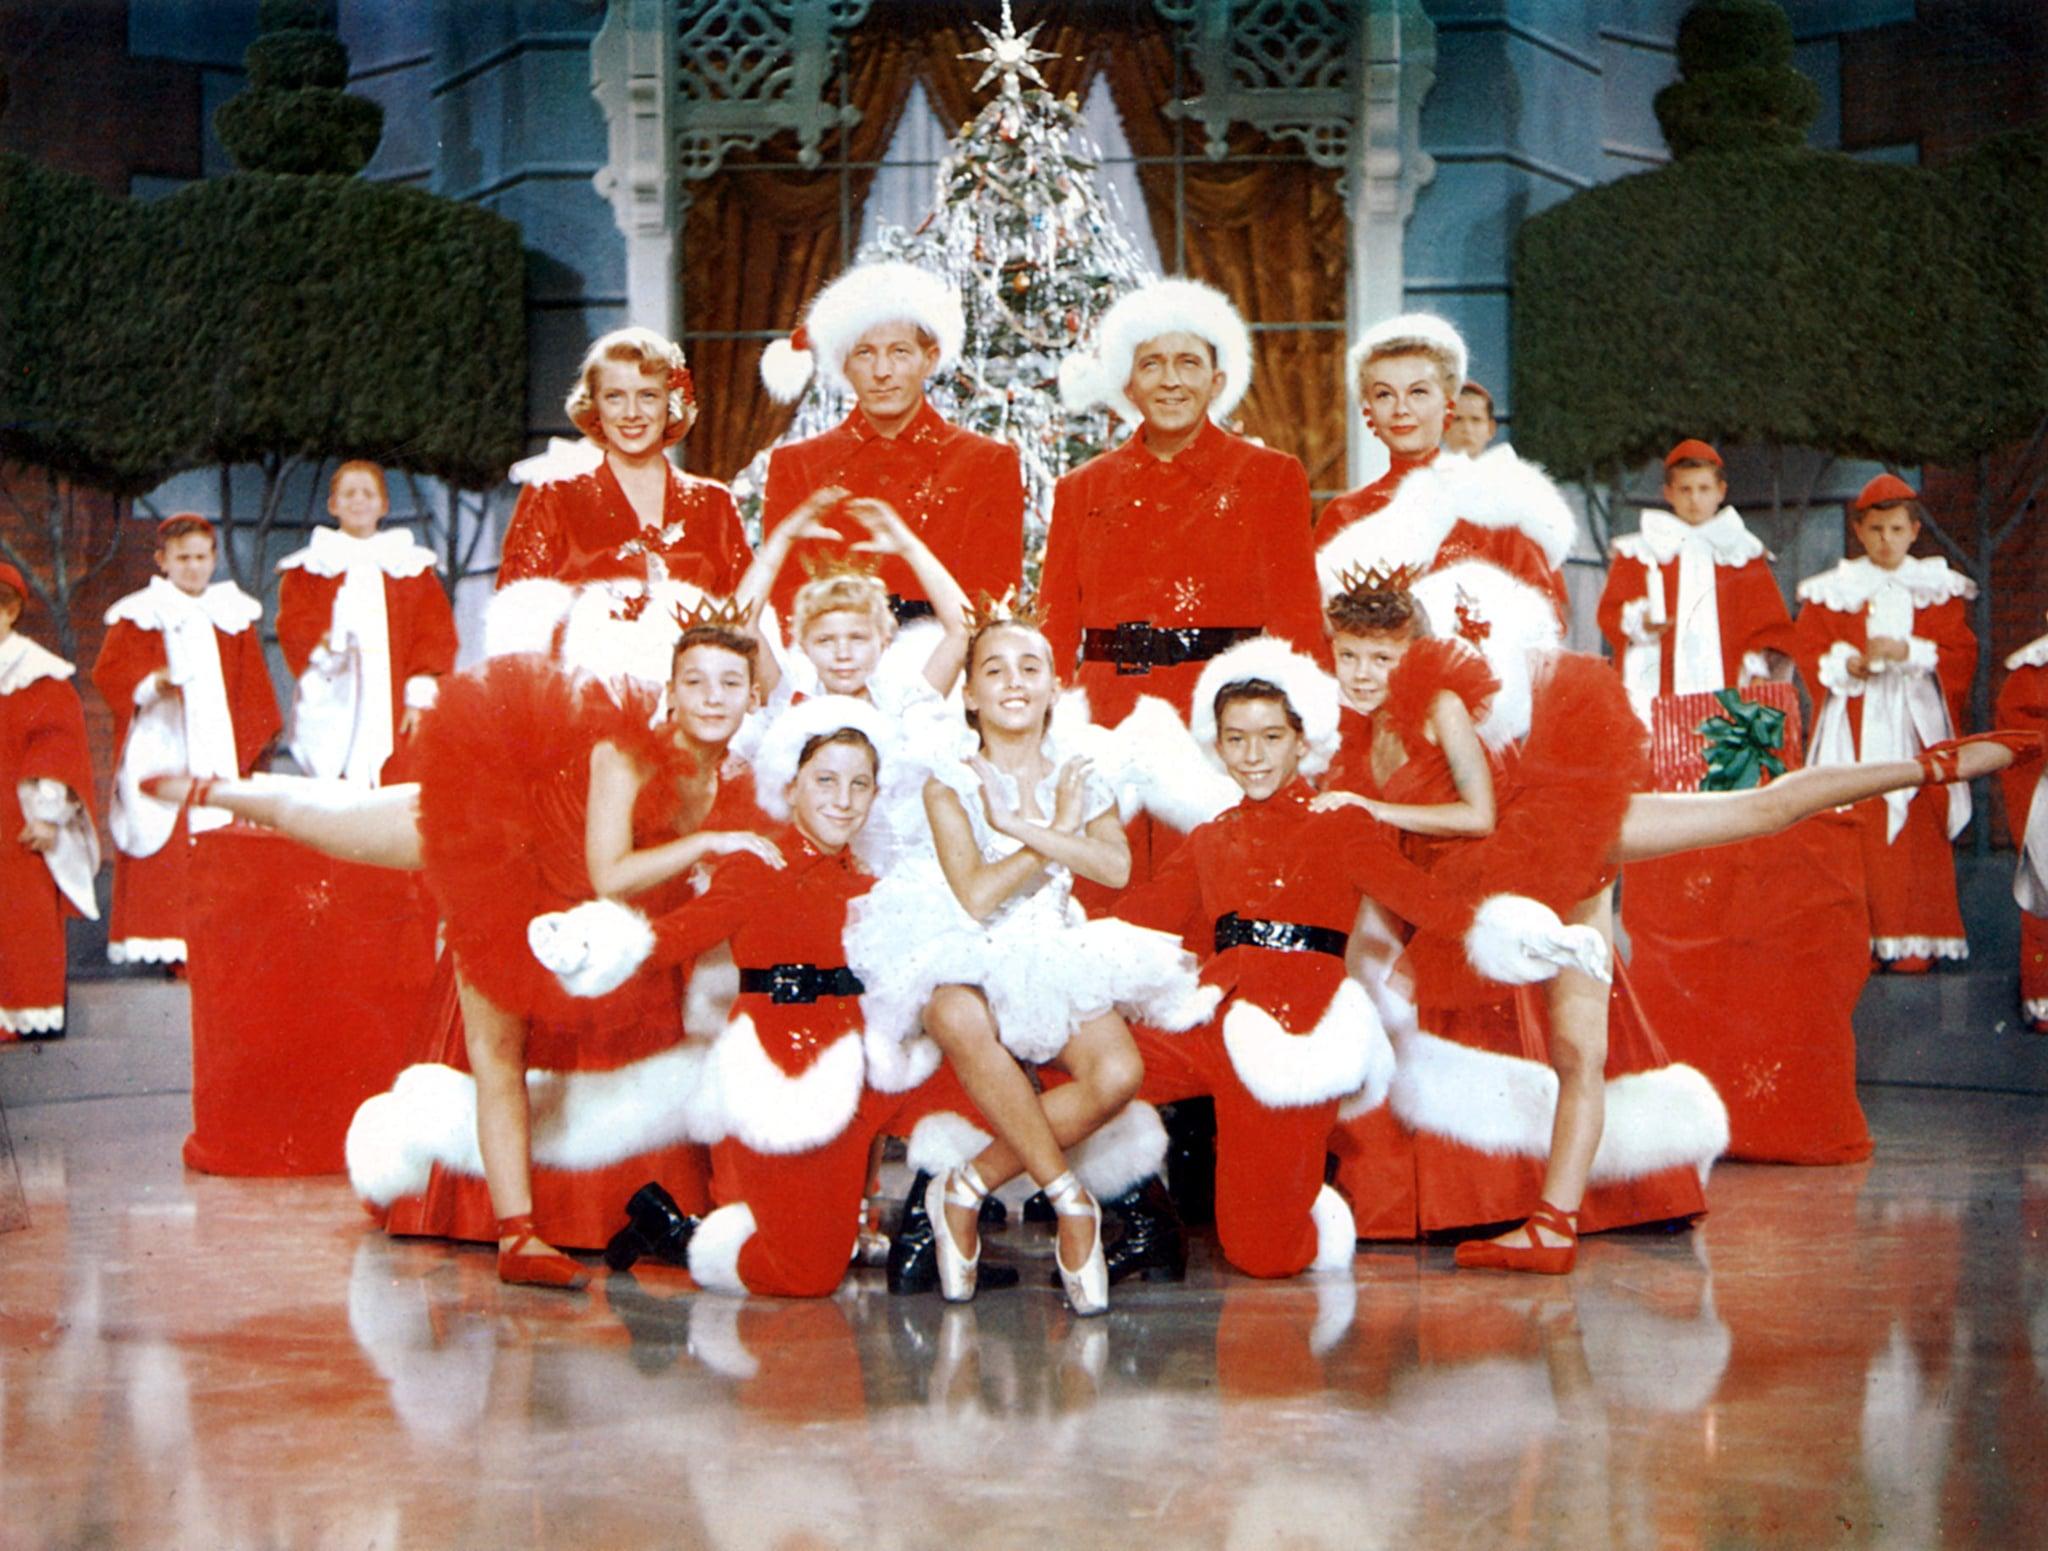 WHITE CHRISTMAS, Rosemary Clooney, Danny Kaye, Bing Crosby, Vera-Ellen, 1954